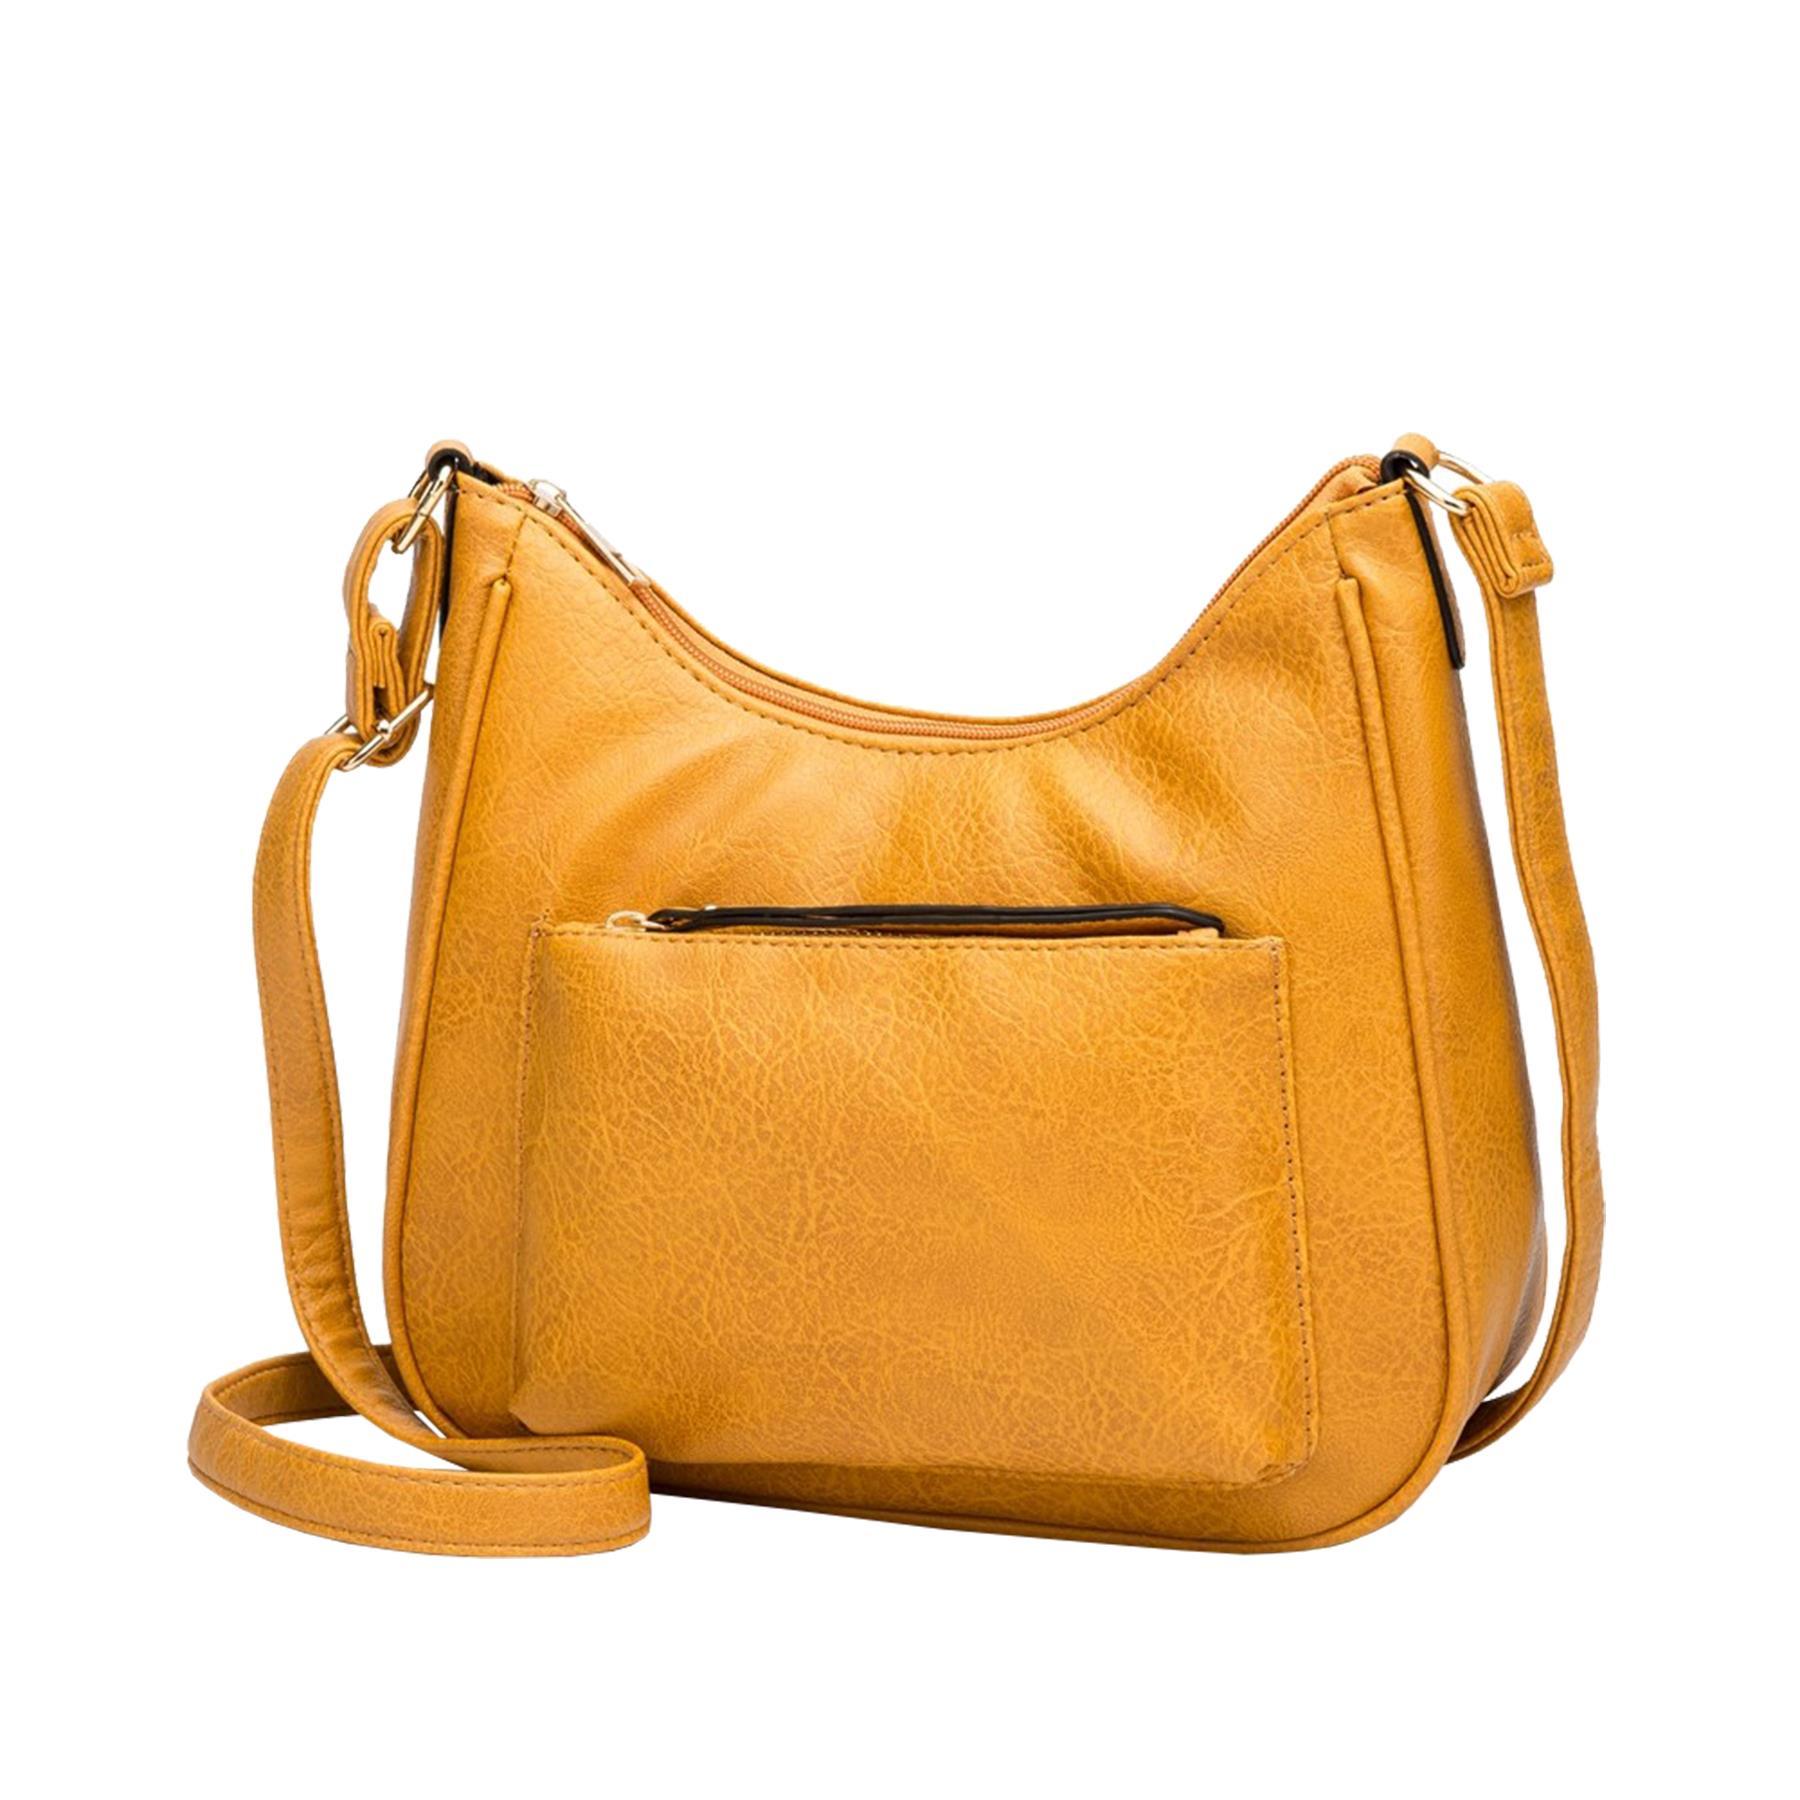 New-Soft-Synthetic-Leather-Front-Pocket-Ladies-Casual-Crossbody-Bag-Handbag thumbnail 12